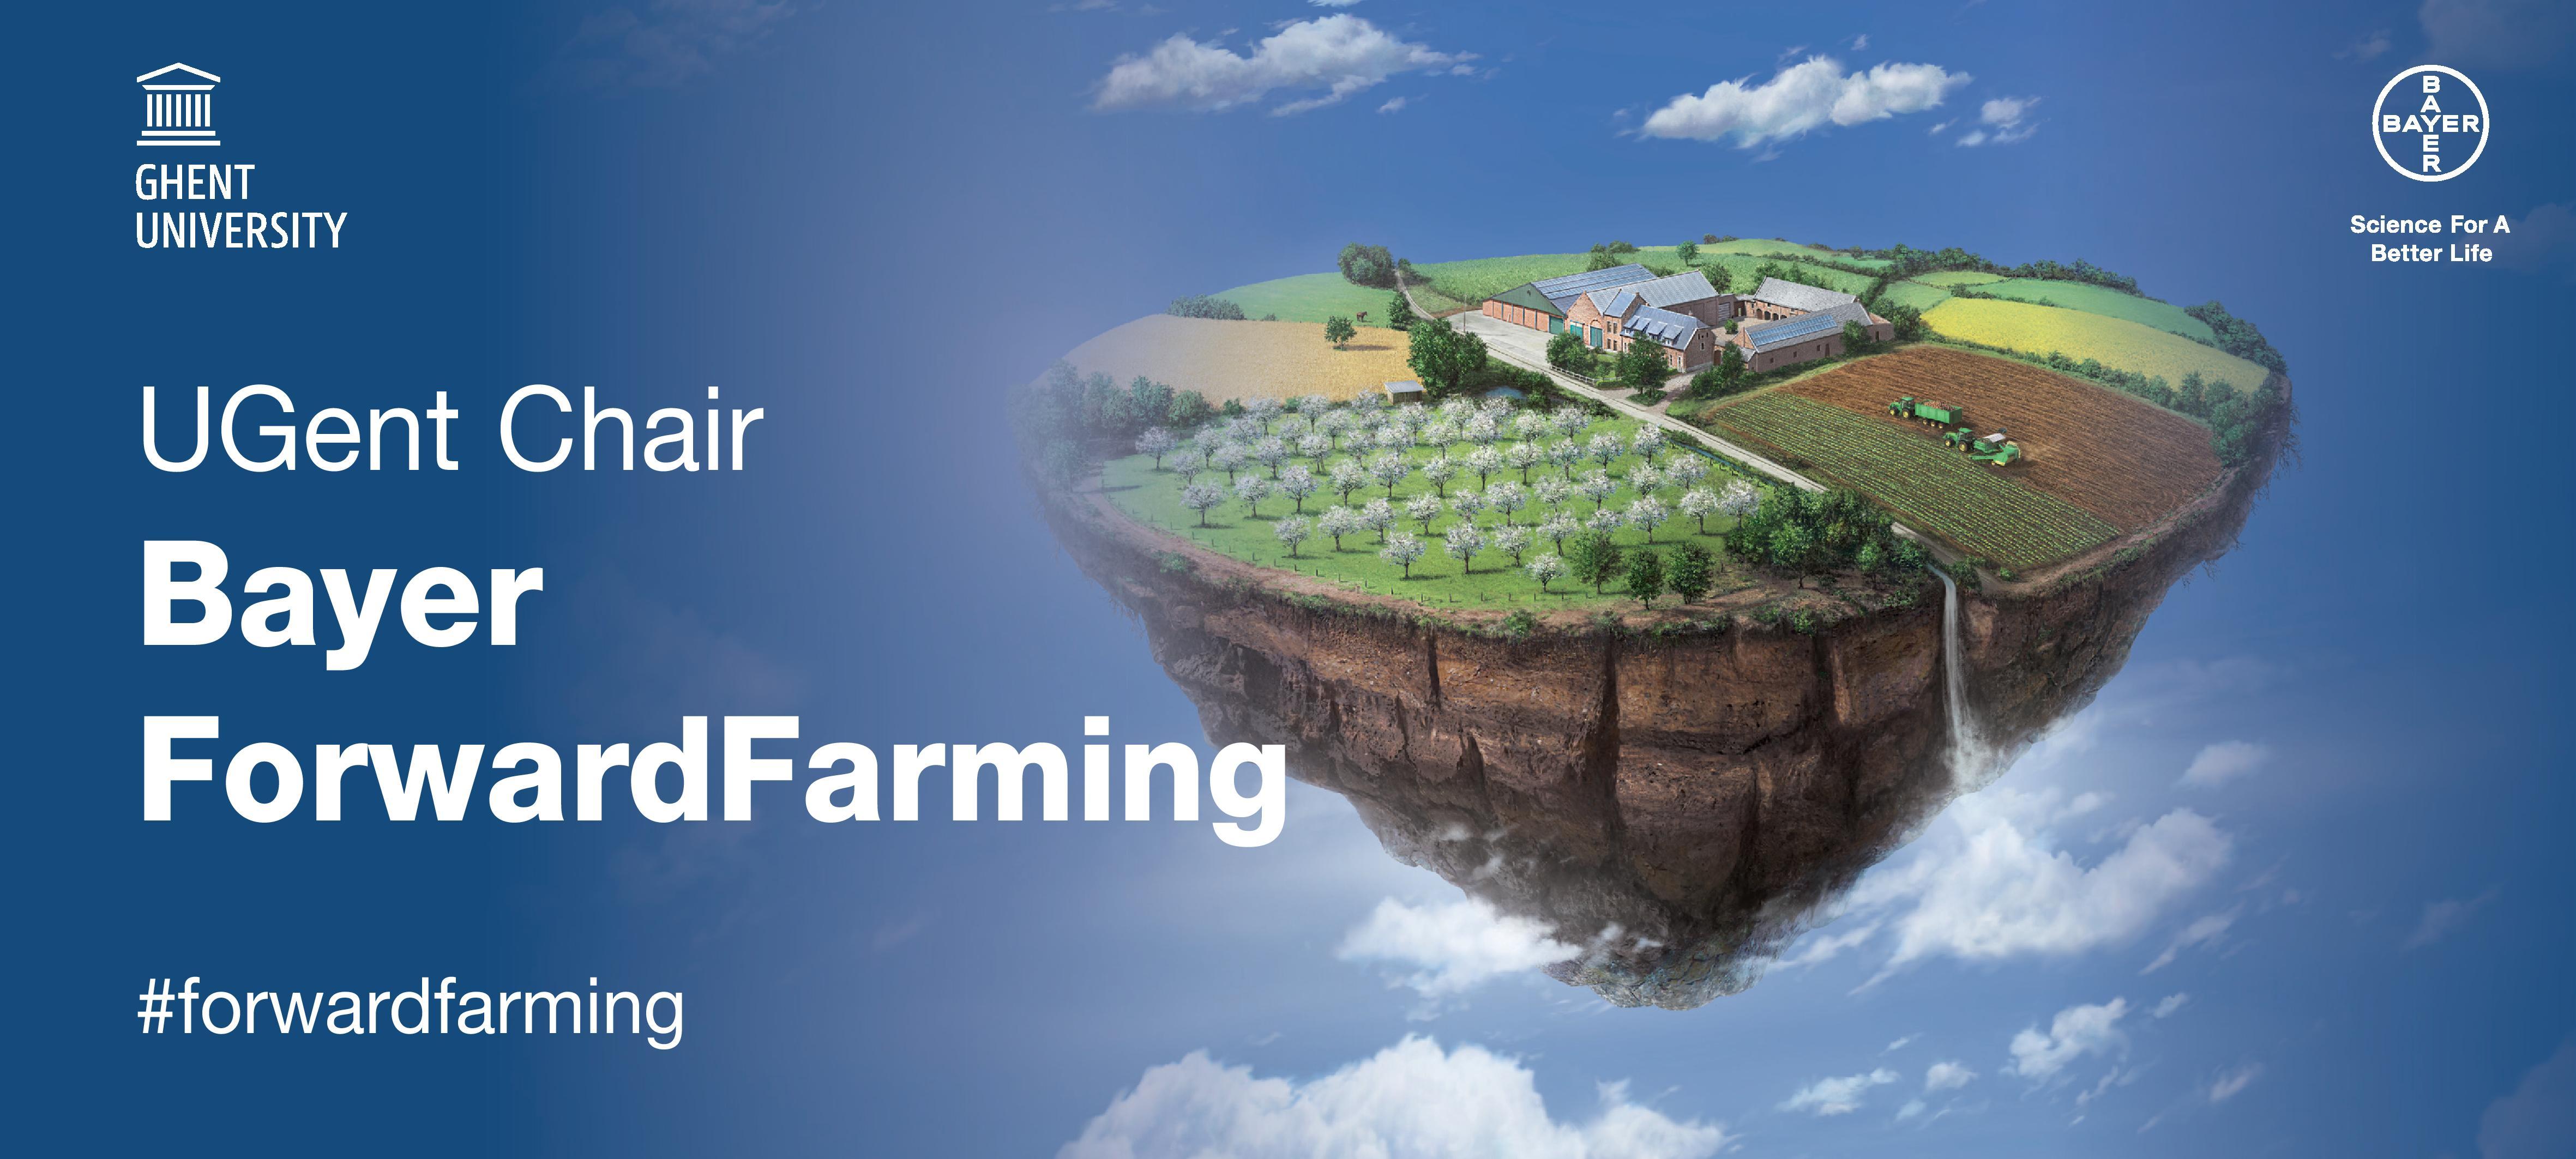 Bayer ForwardFarming banner